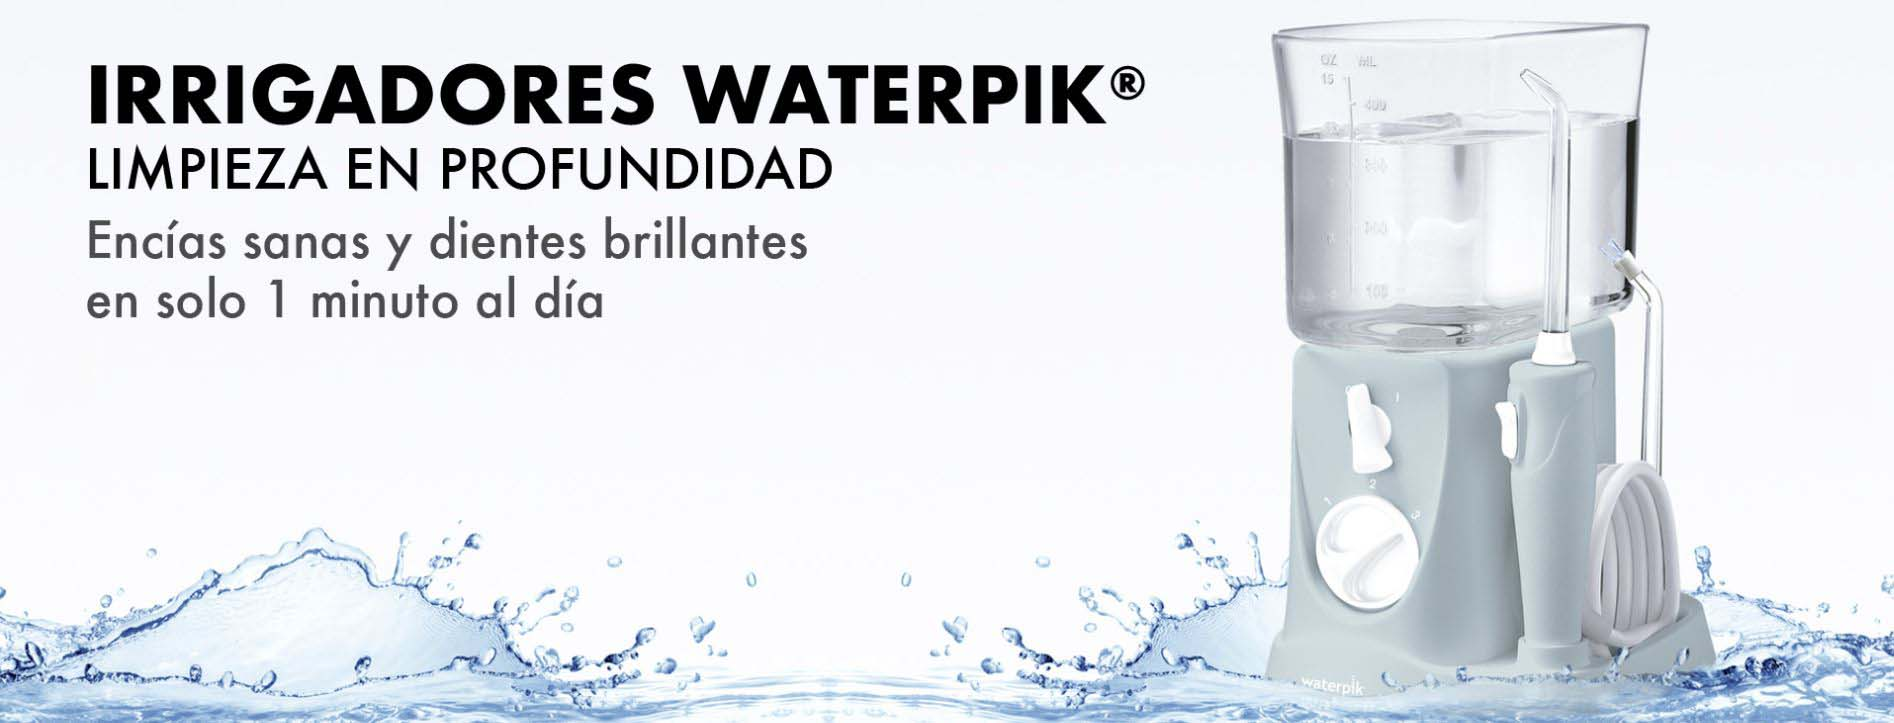 WATERPIK Irrigadores